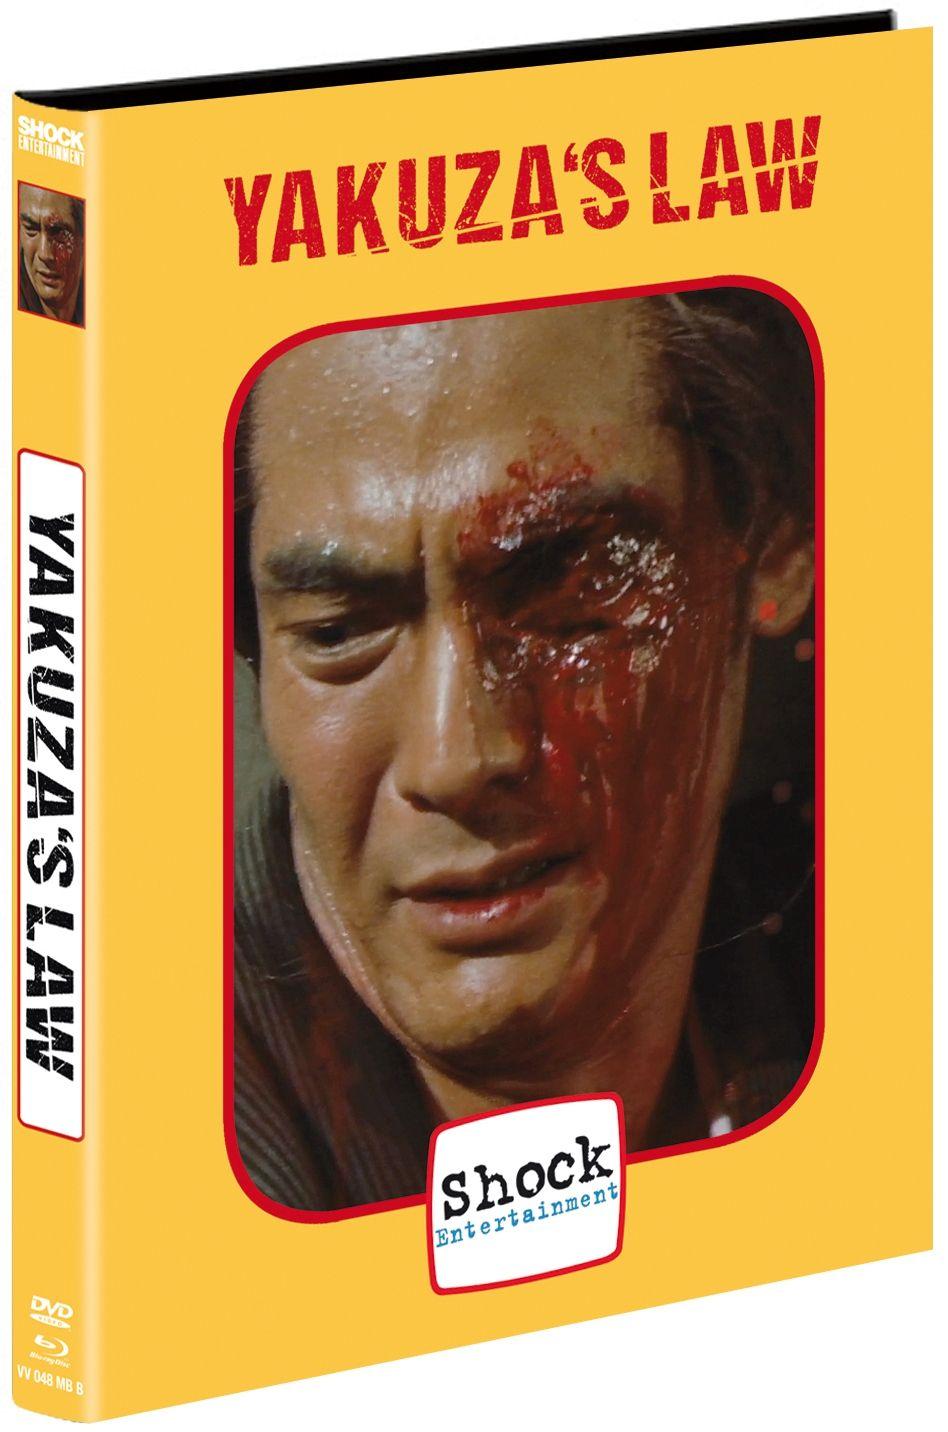 Yakuza's Law (Lim. Uncut Mediabook - Cover B) (DVD + BLURAY)